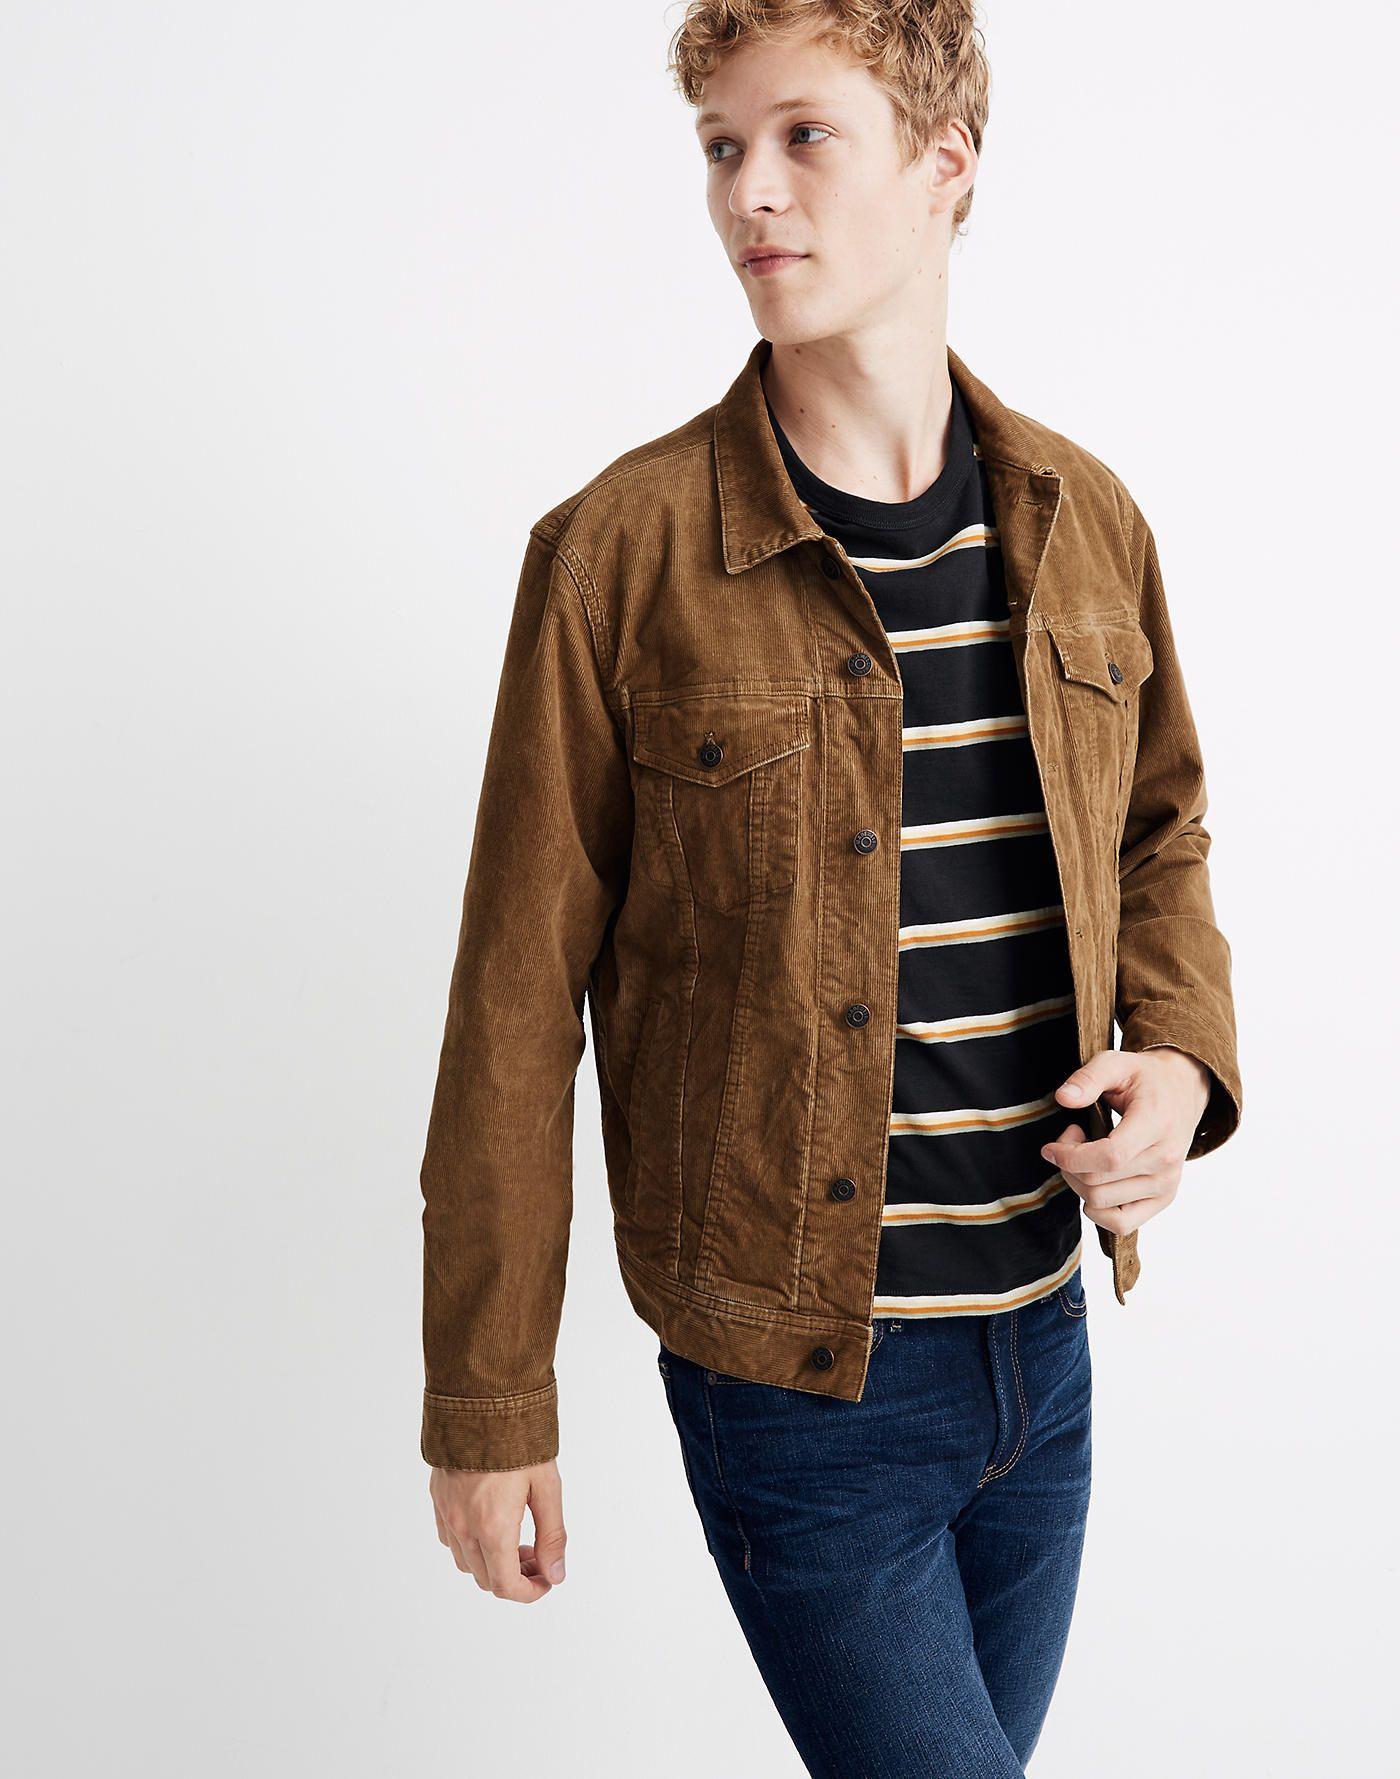 Classic Jean Jacket Corduroy Edition Denim Jacket Men Classic Jeans Jean Jacket [ jpg ]